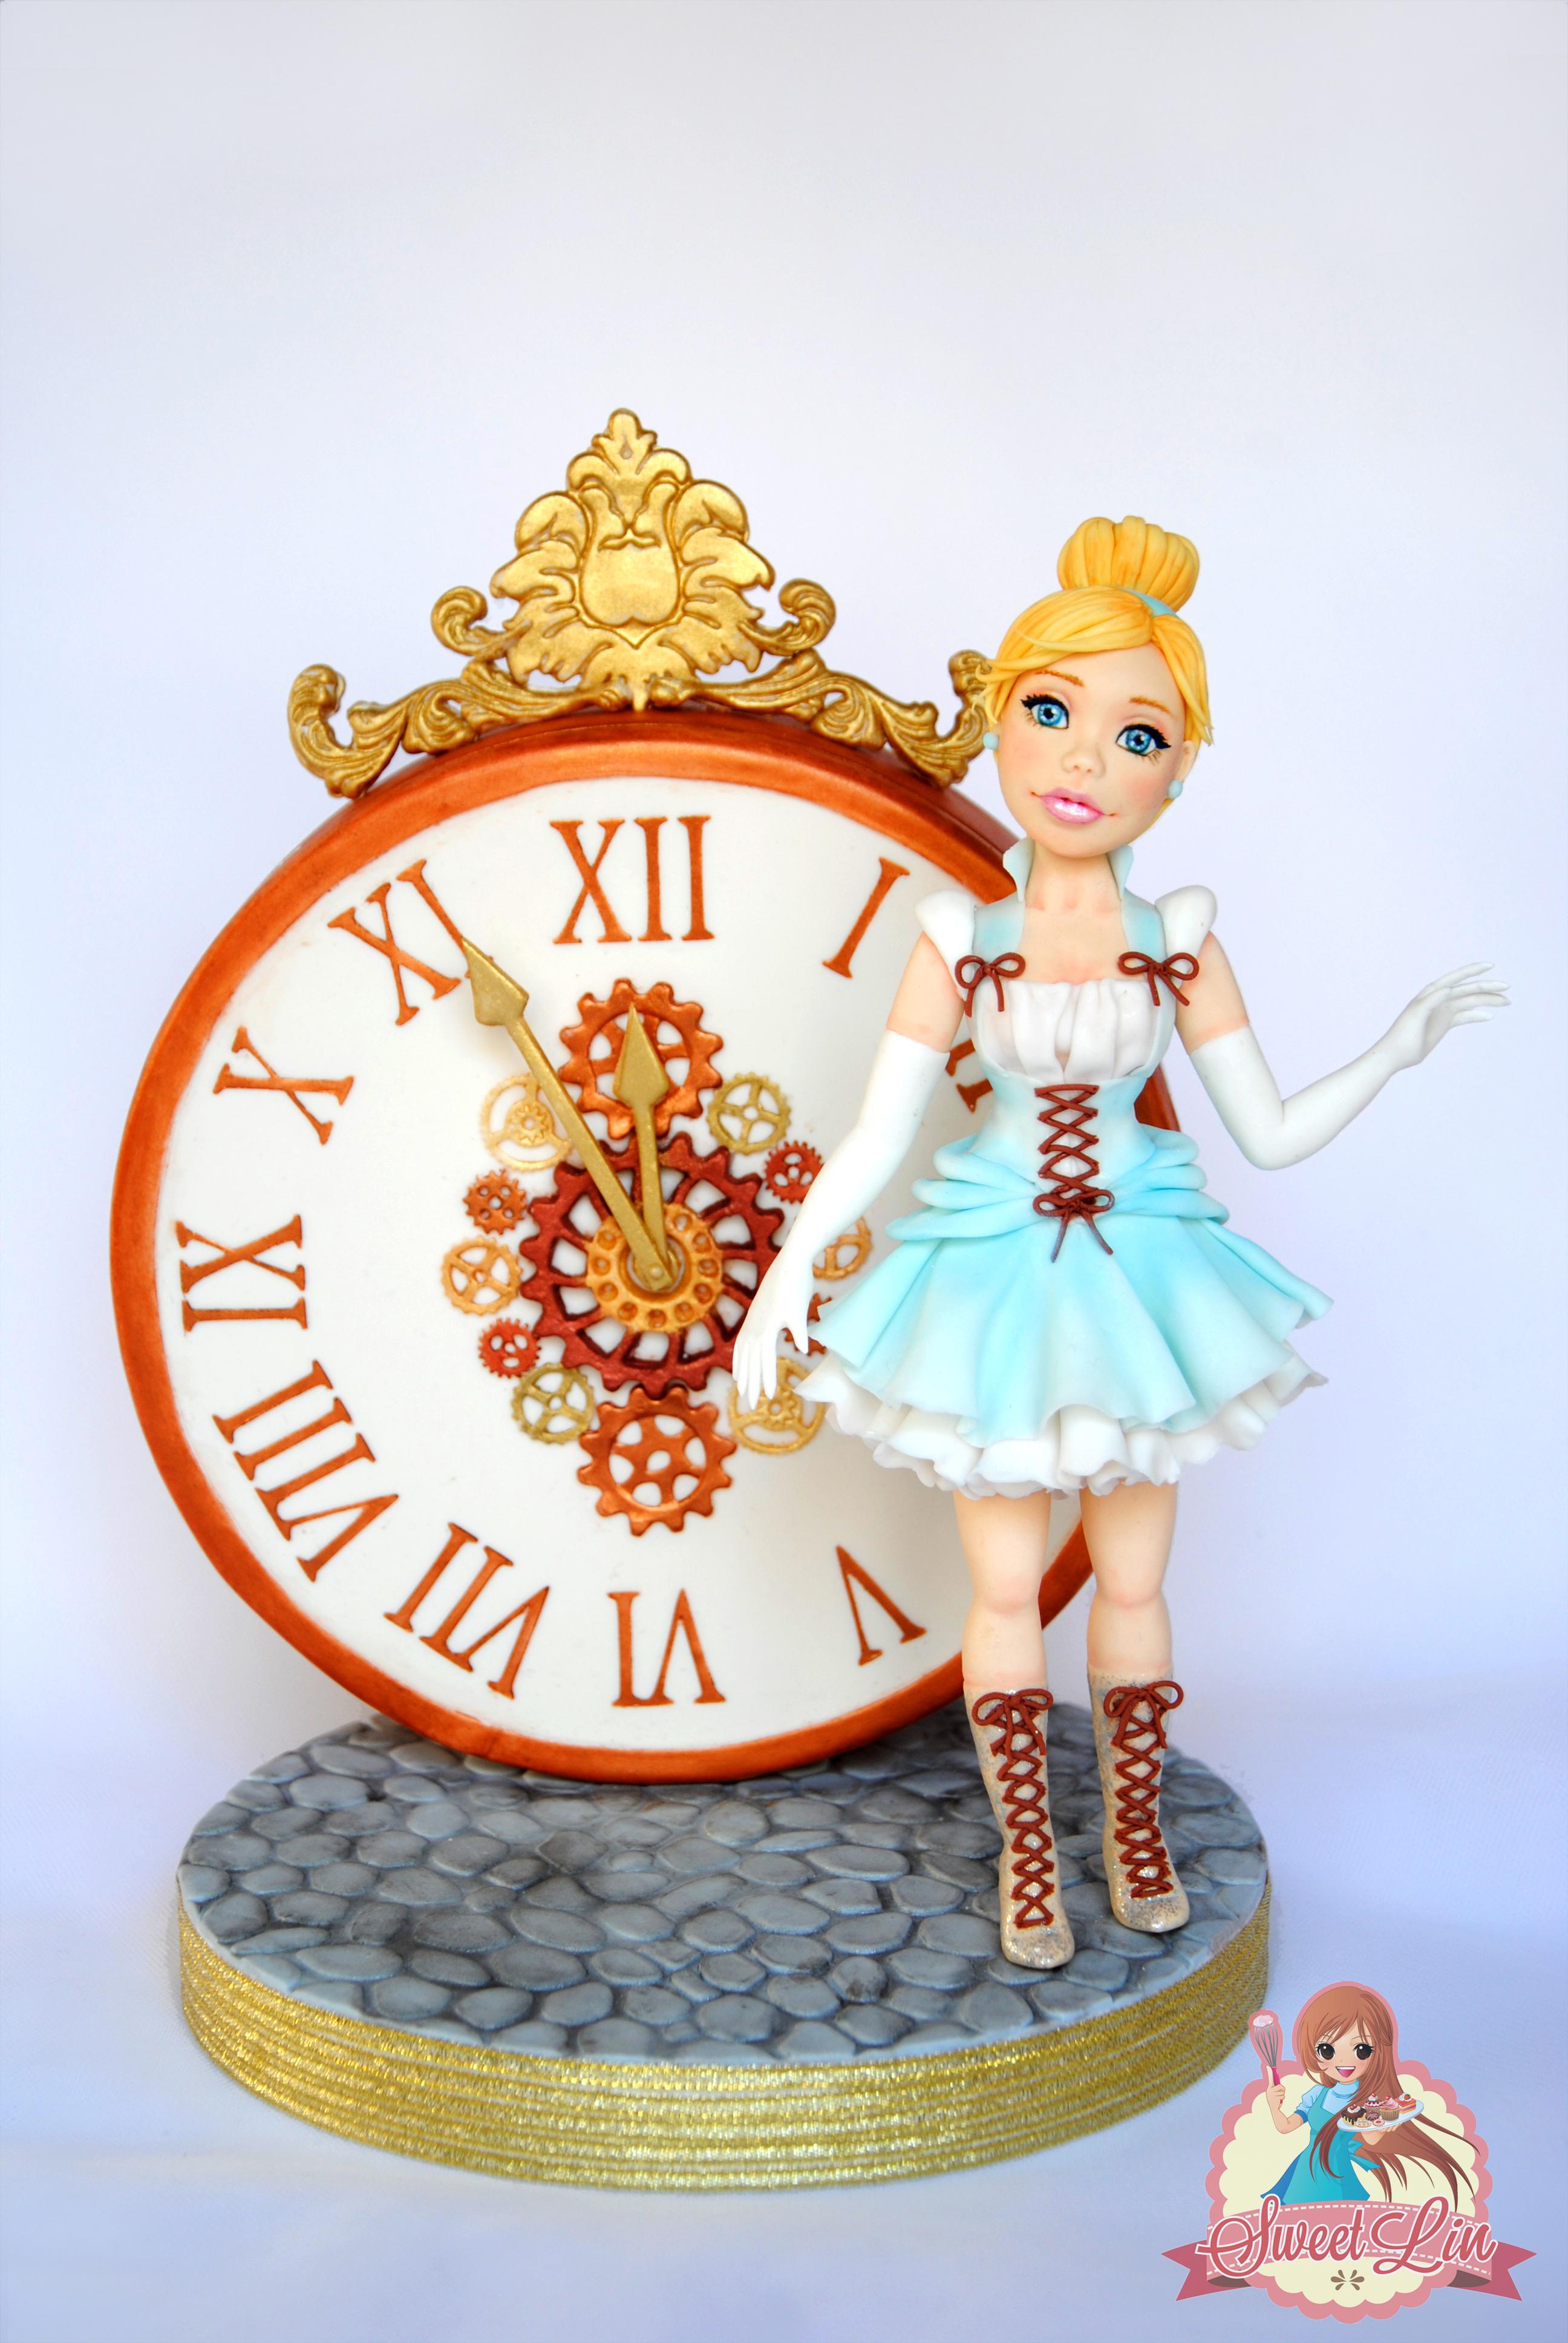 Tell-A-Fairy-Tale-Linasari-Sunyoto.jpg#asset:15342